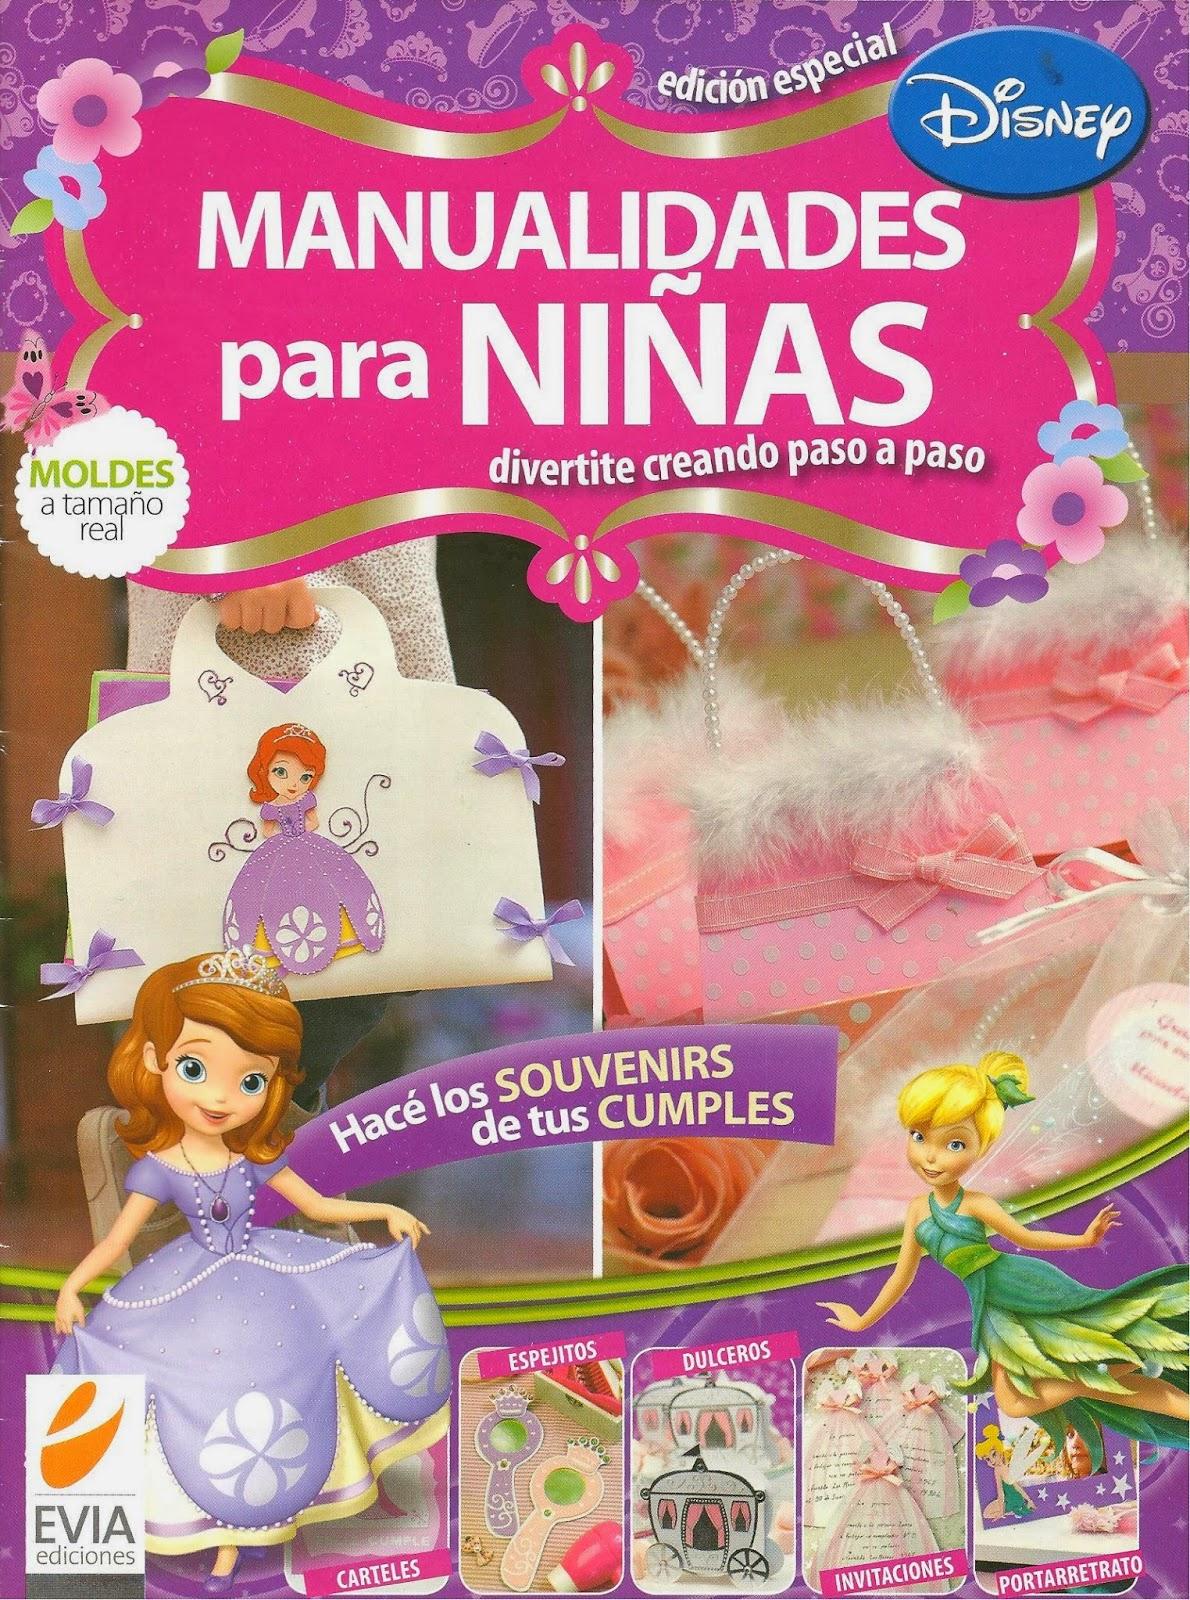 Revista Manualidades Para Ninas Revistas De Manualidades Gratis - Manualidades-nias